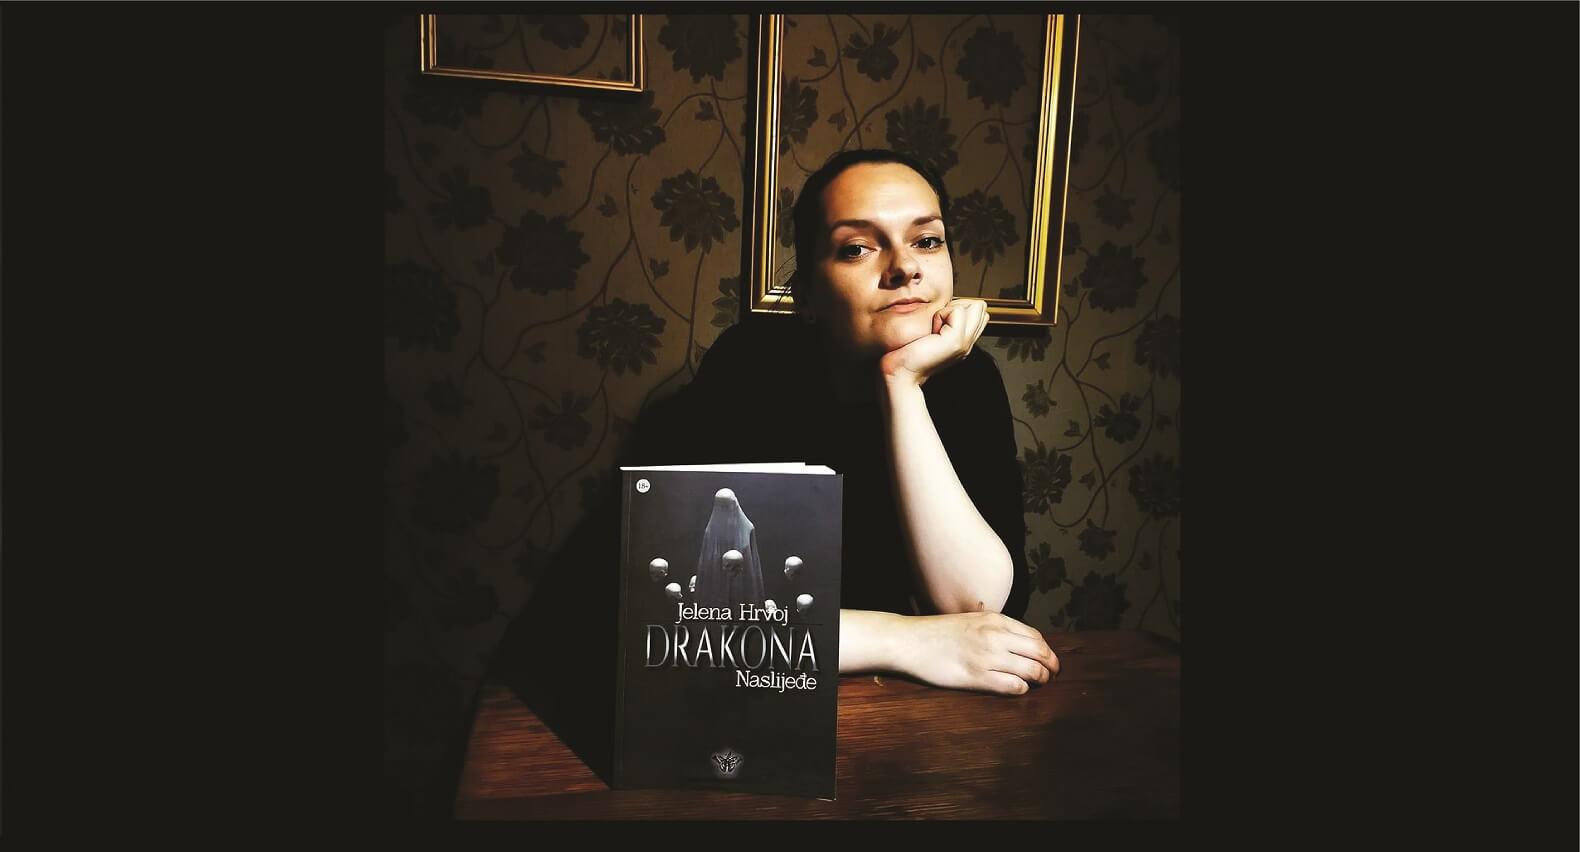 "Mlada hrvatska književnica Jelena Hrvoj izdala je peti roman – psihološki triler s elementima horora pod nazivom ""Drakona – Naslijeđe"""